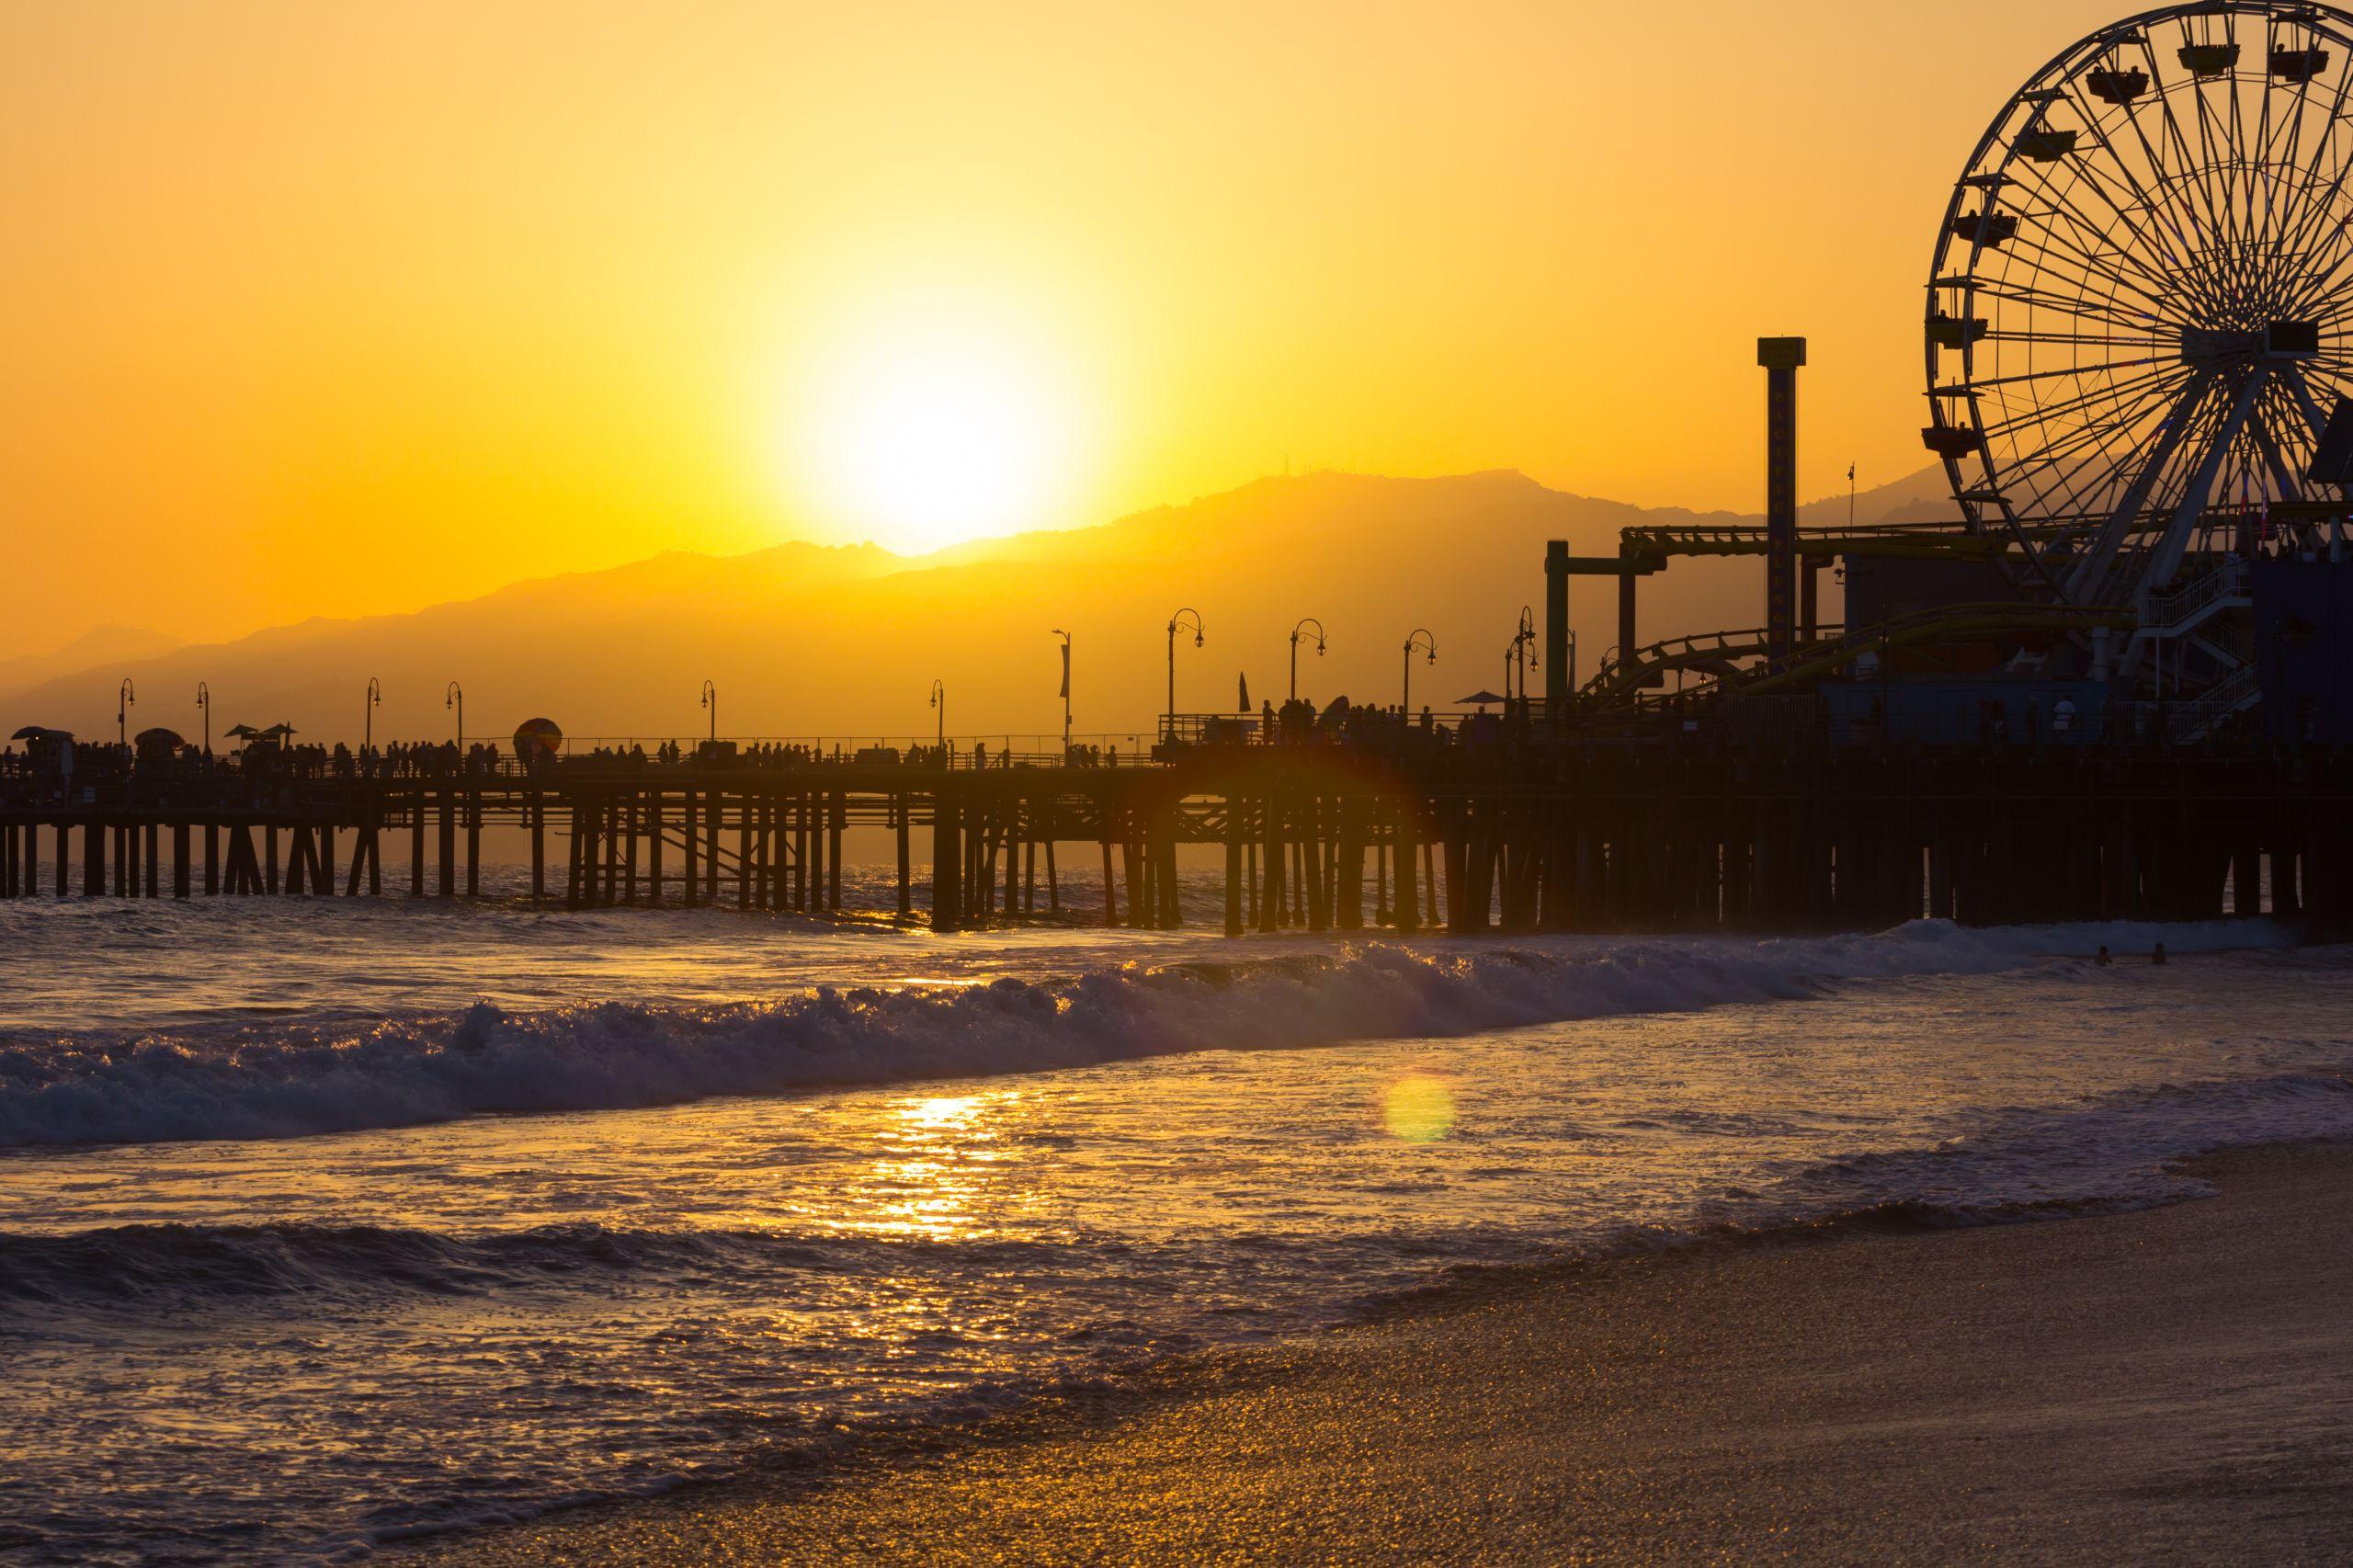 Santa Monica, CA Pier